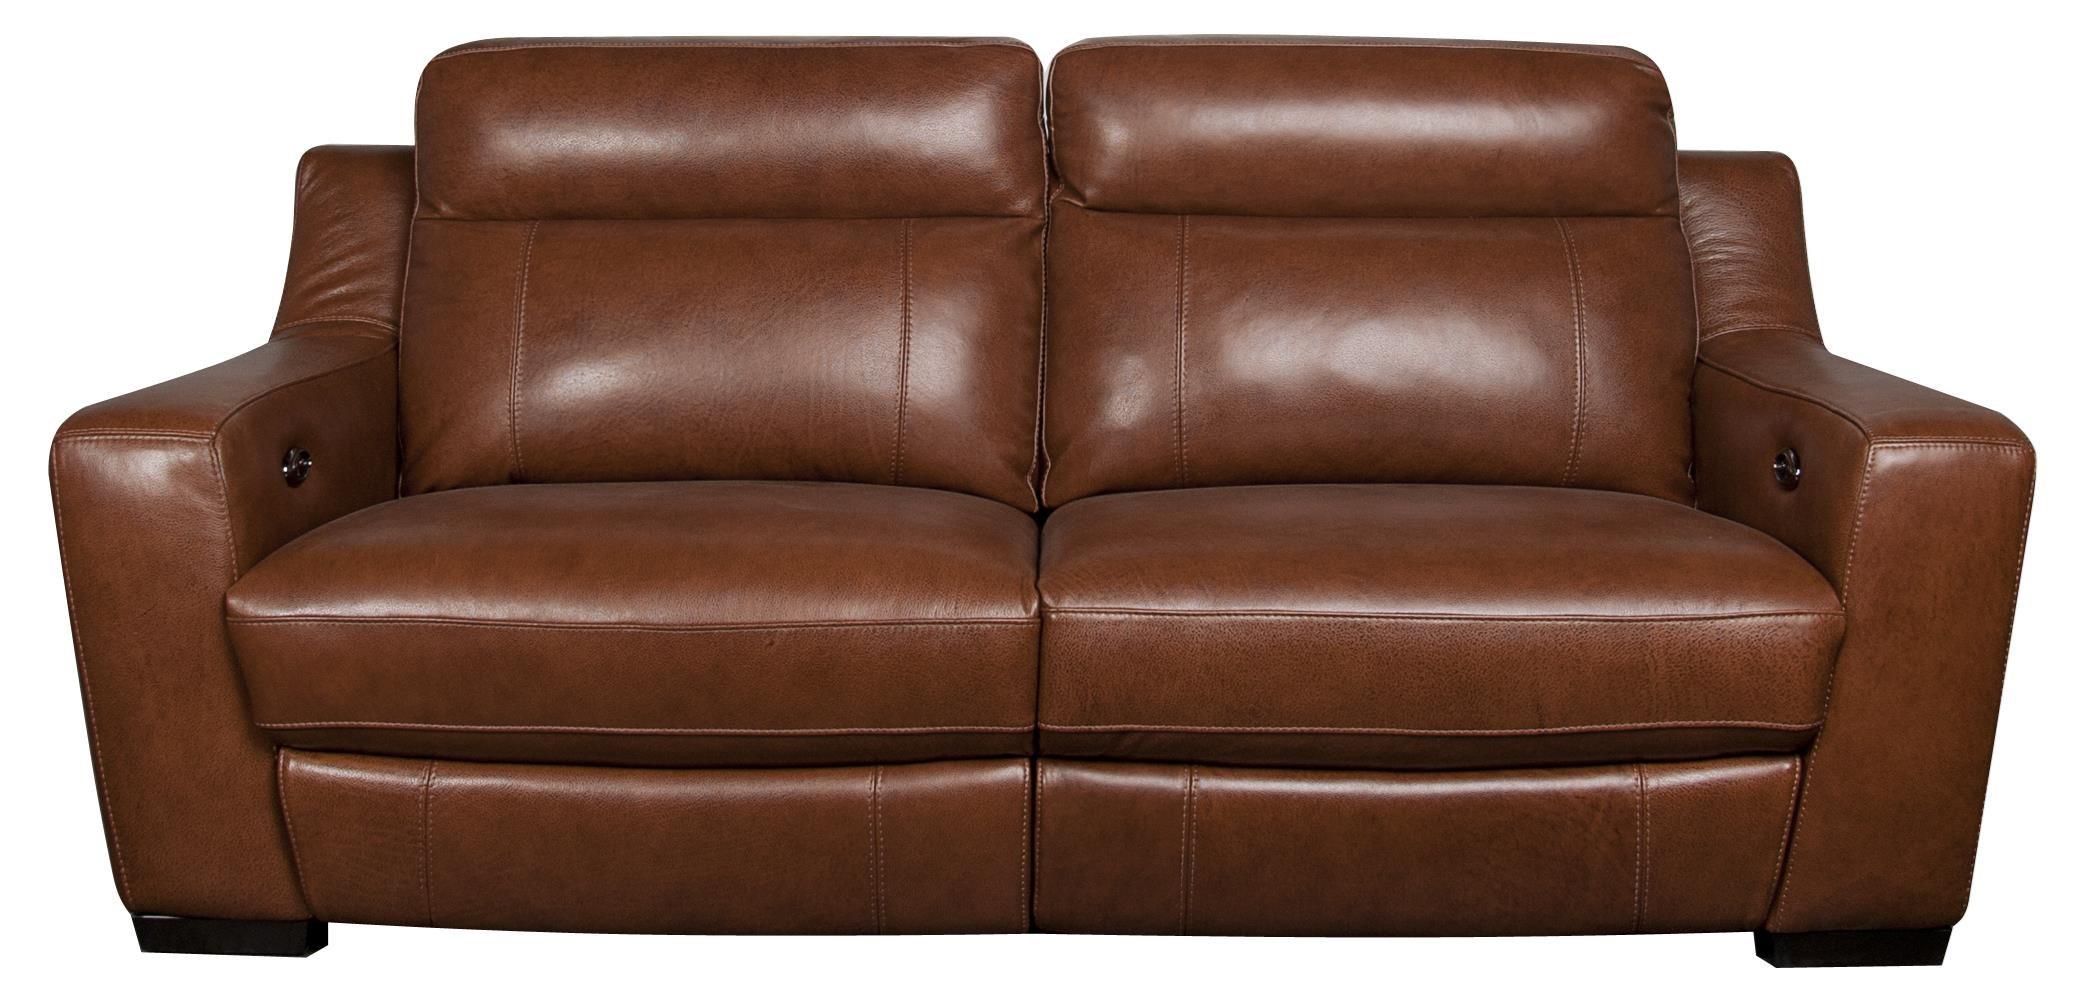 san lorenzo andy modern leather match power reclining sofa morris rh morrisathome com modern leather power reclining sofa modern white leather recliner sofa